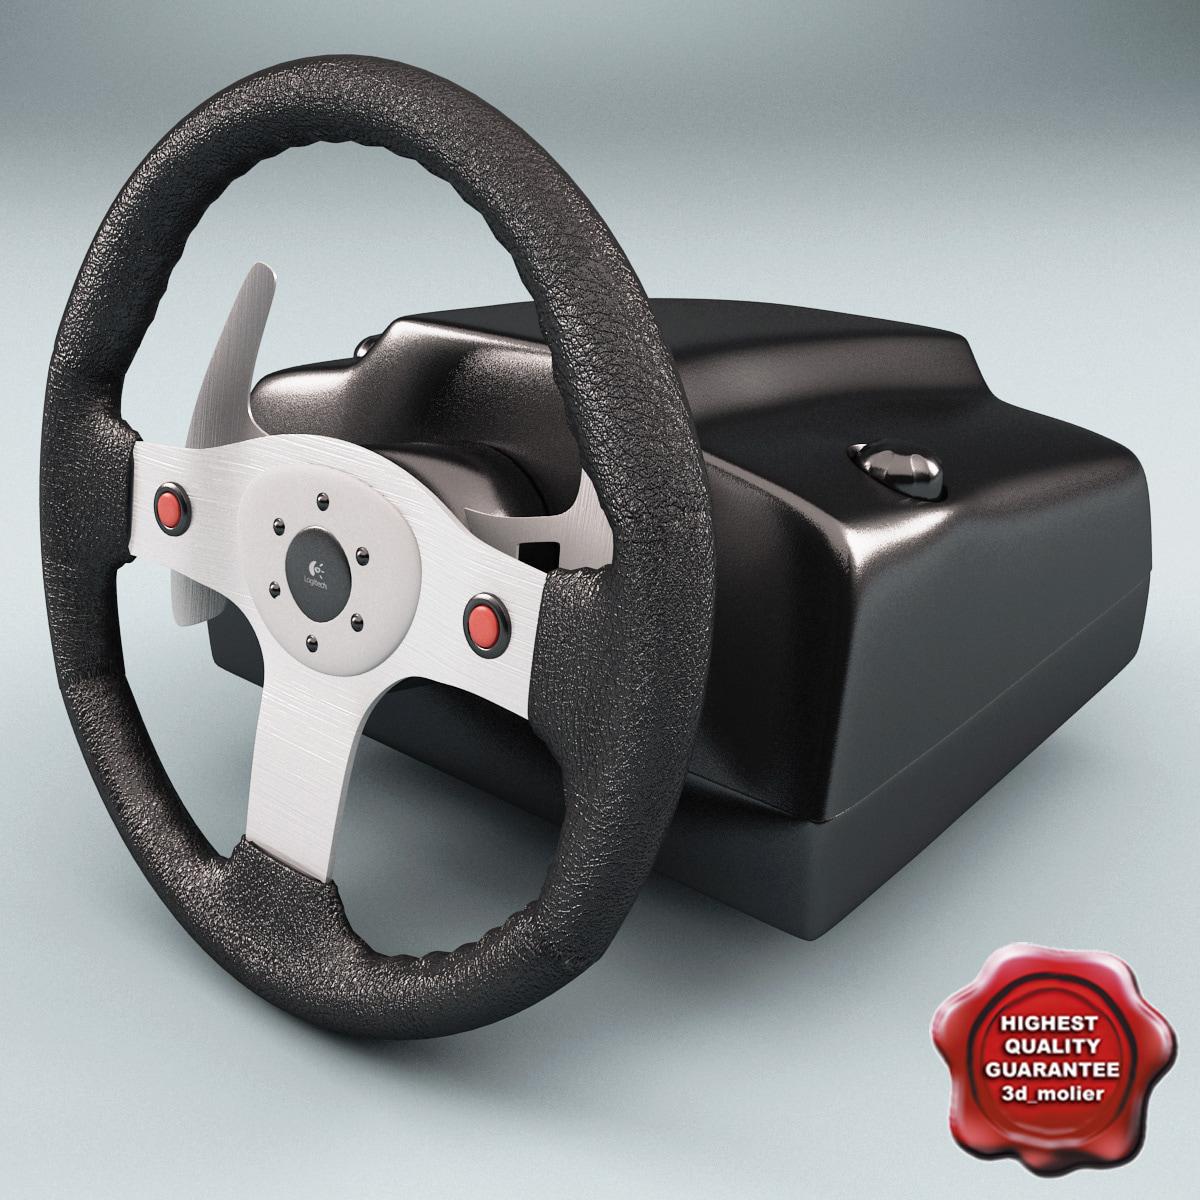 Logitech_Racing_Wheel_0.jpg